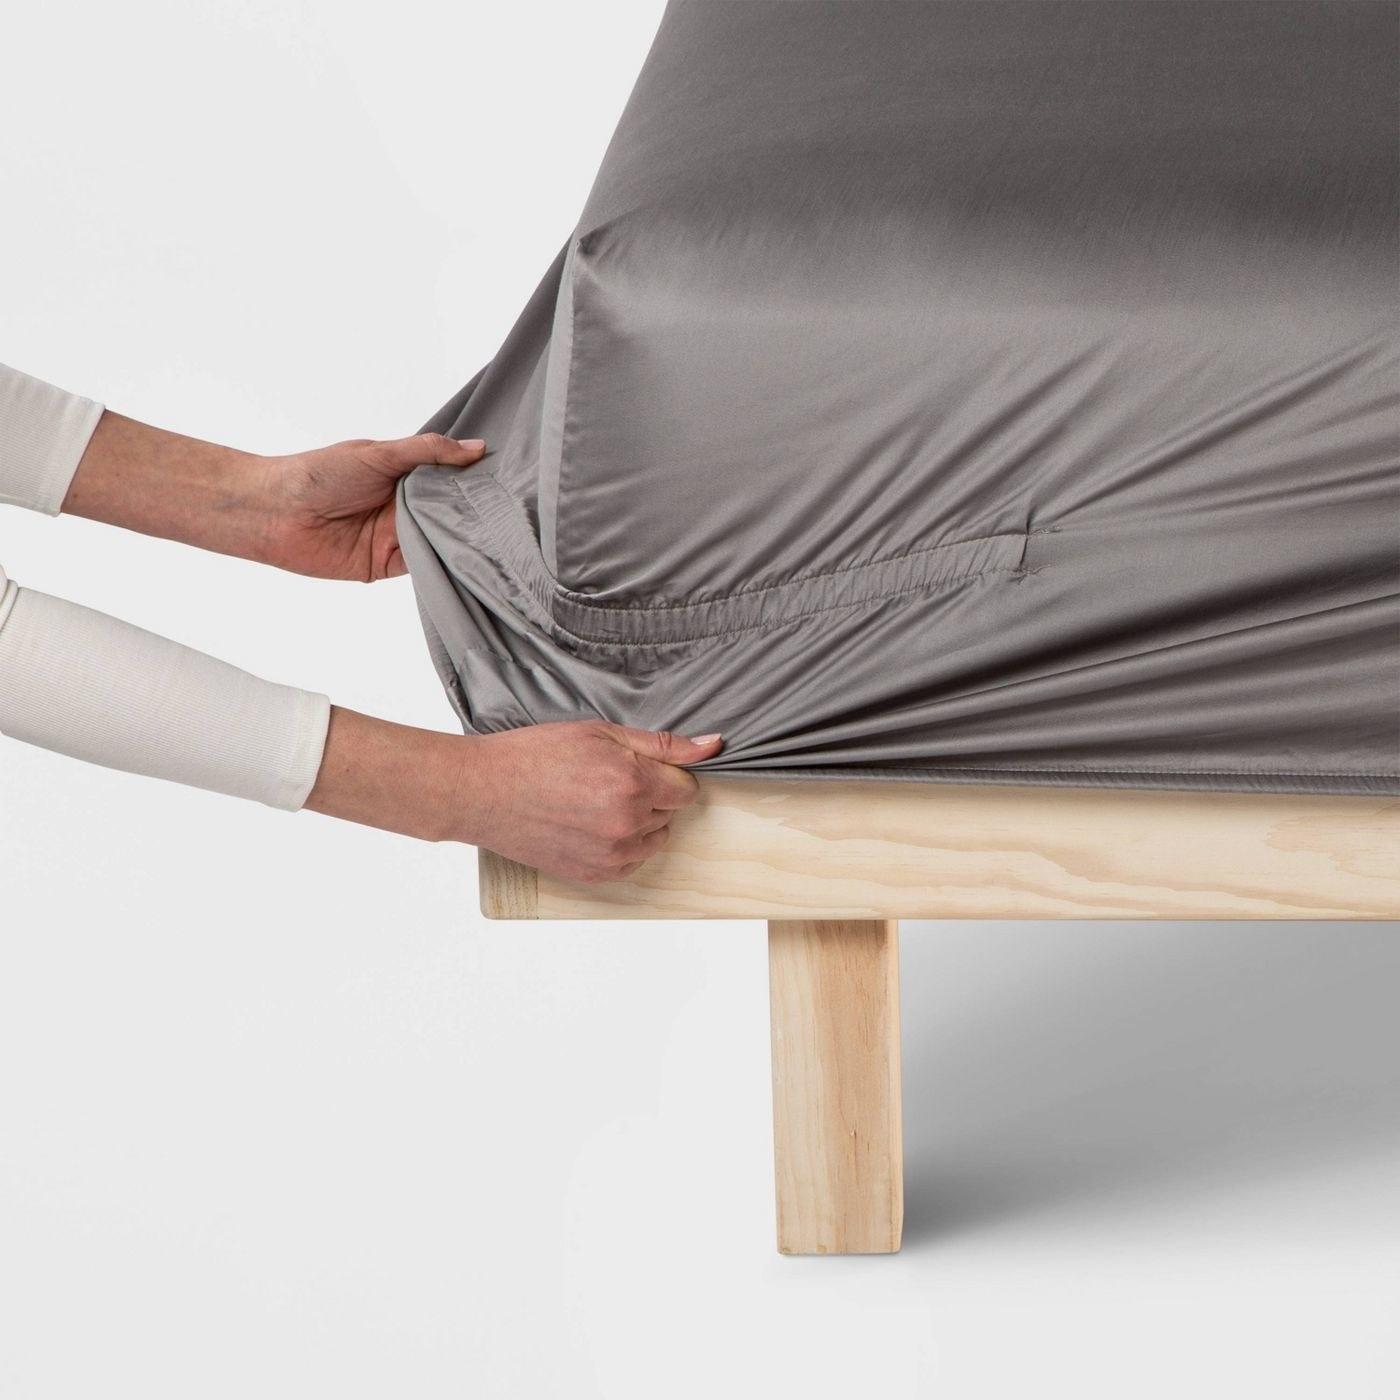 a model putting a fitted sheet on a mattress